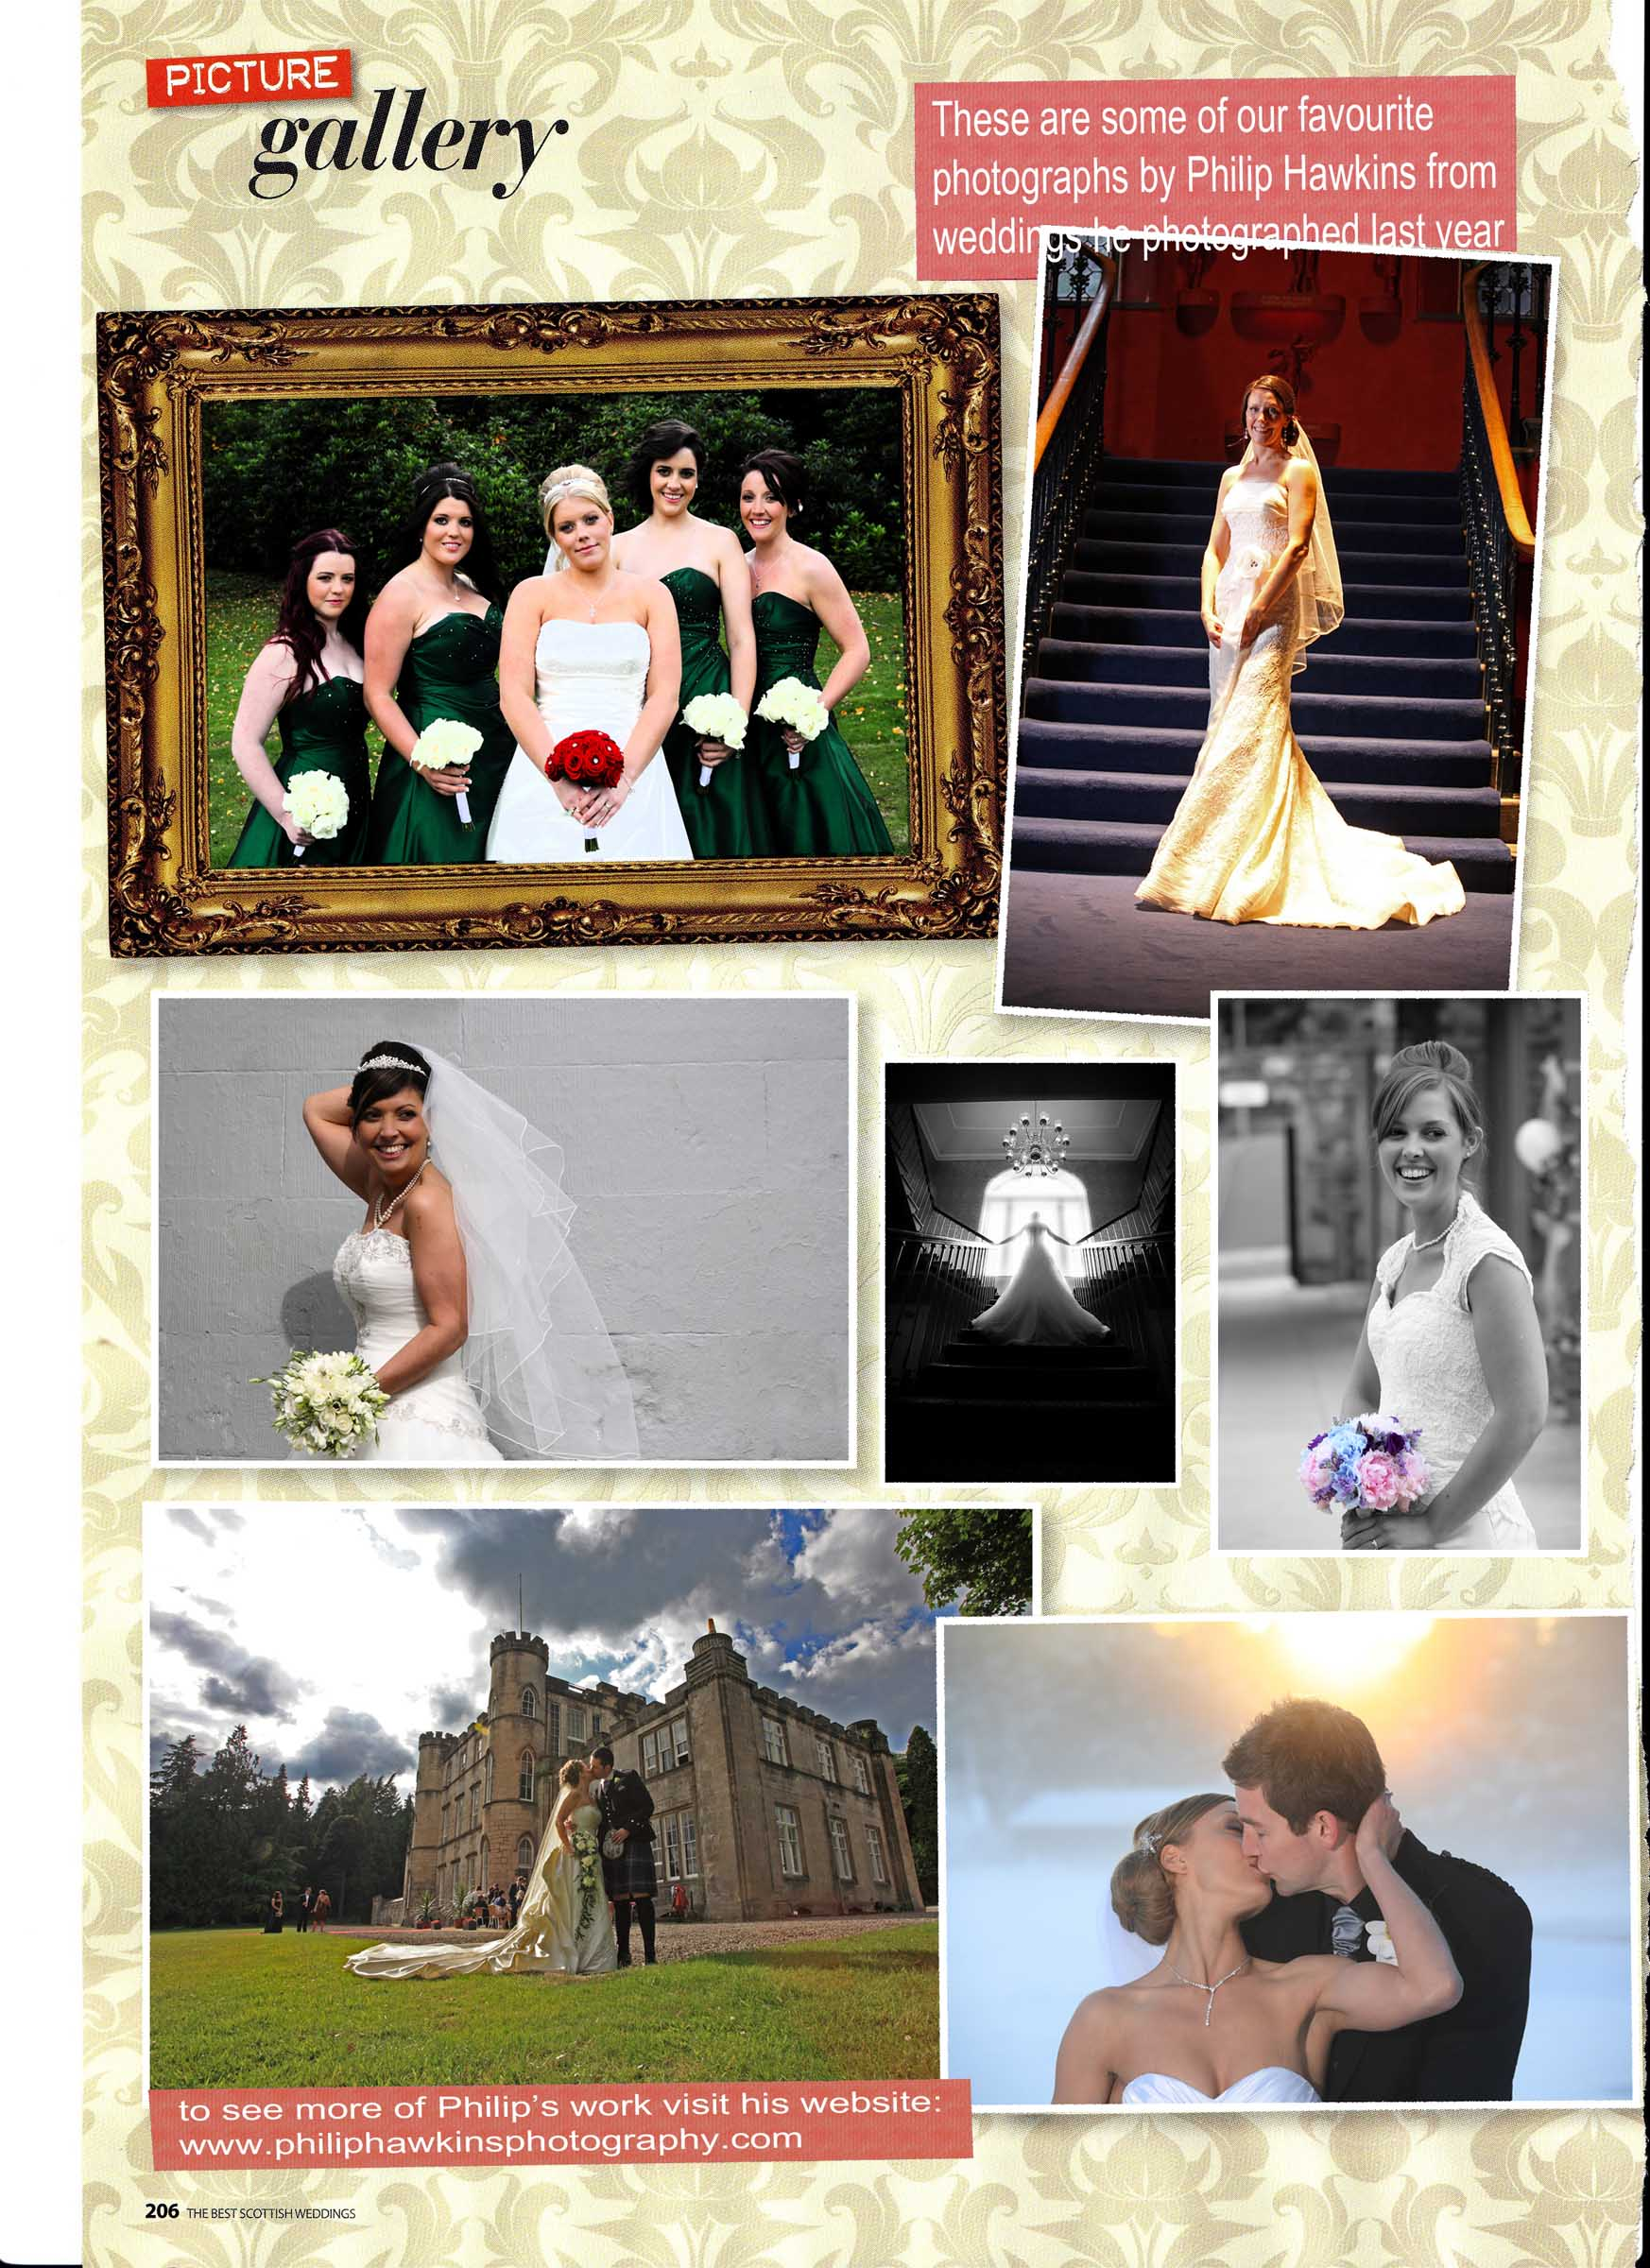 Wedding Photographer magazine feature of Philip Hawkins